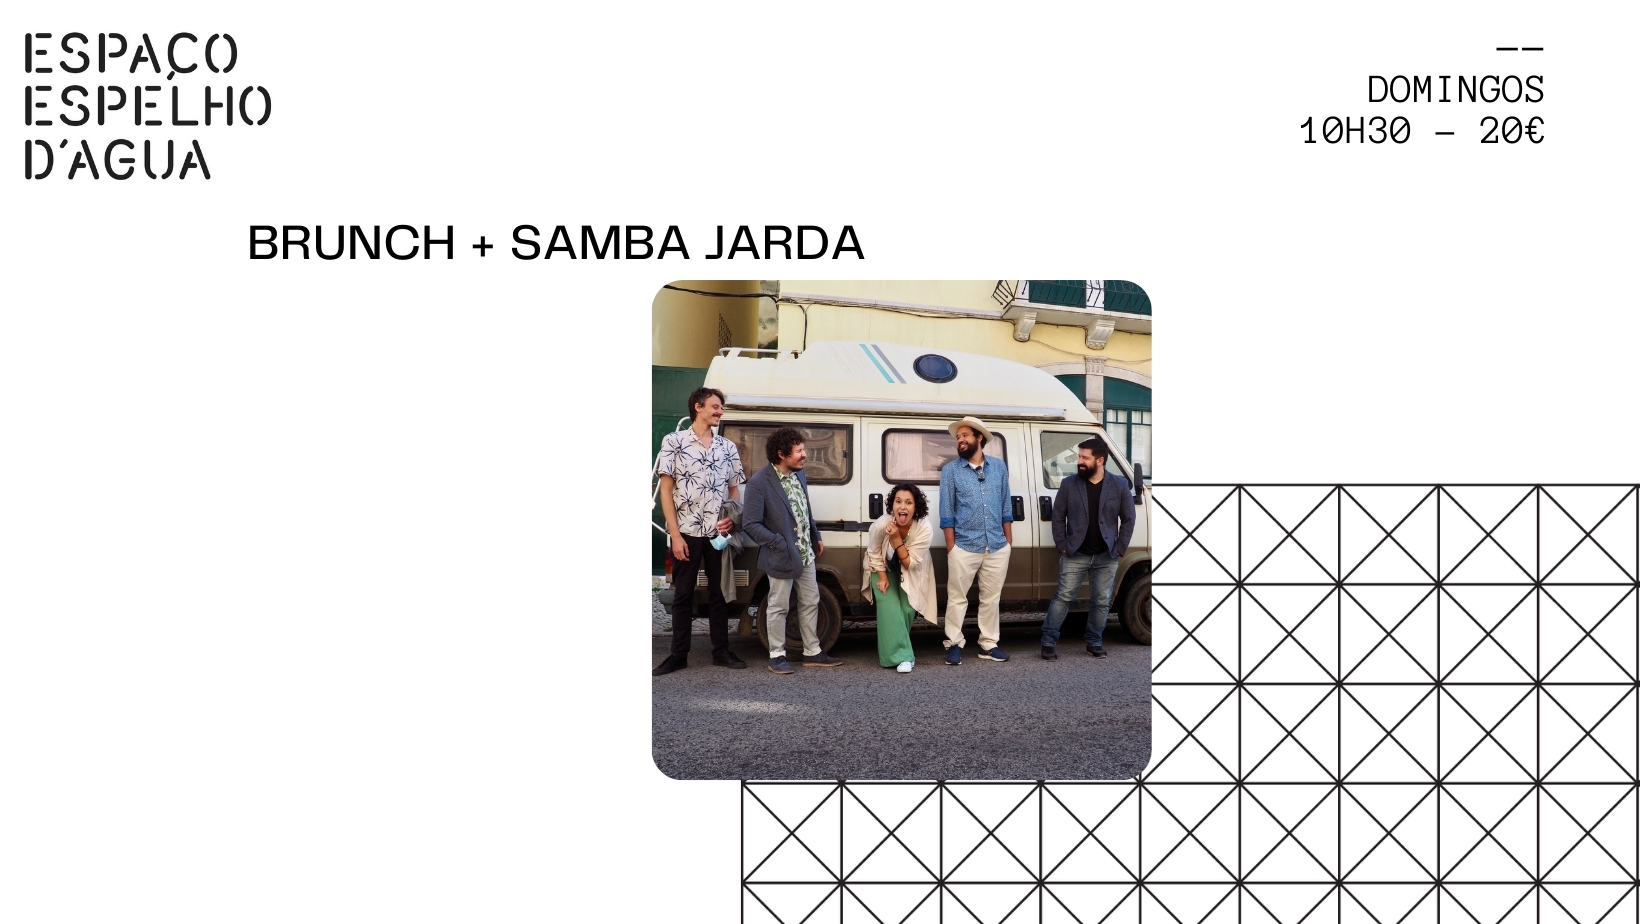 Brunch + Samba Jarda